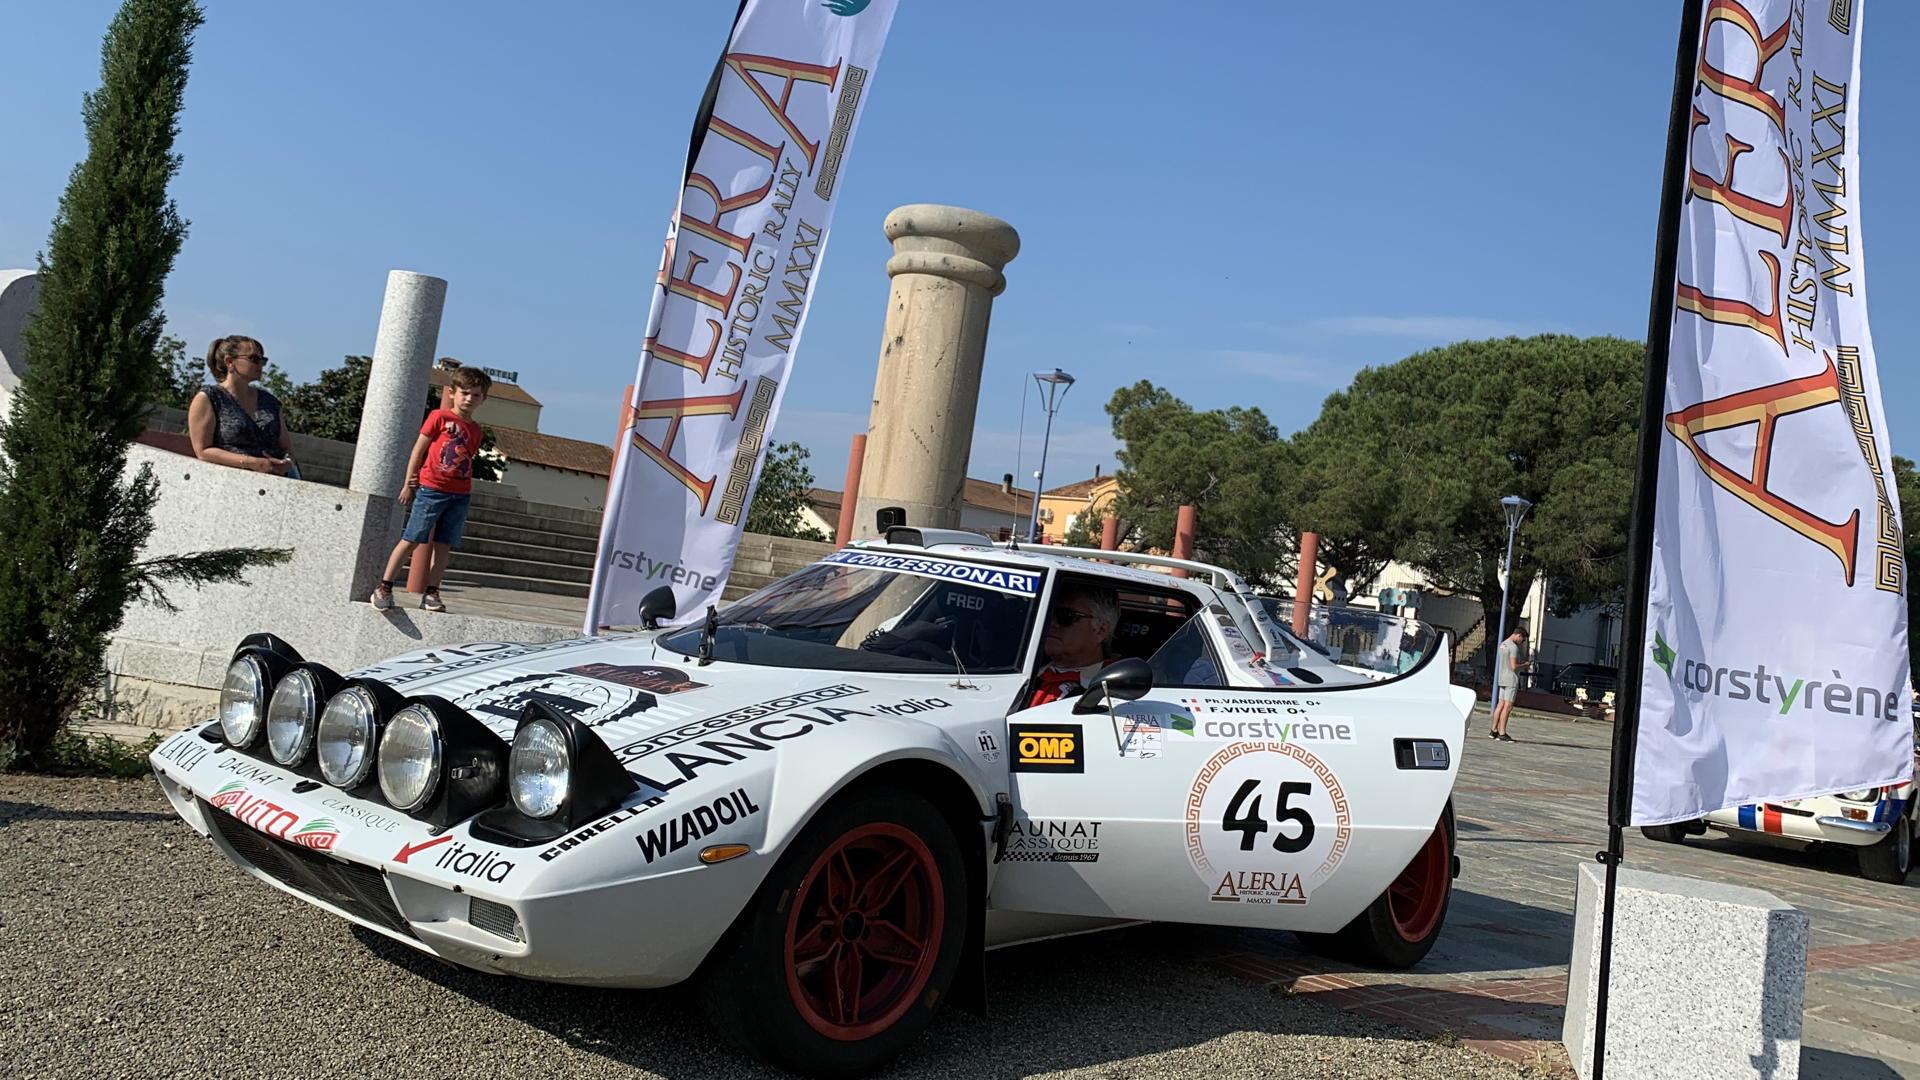 Aleria historic rally 2021